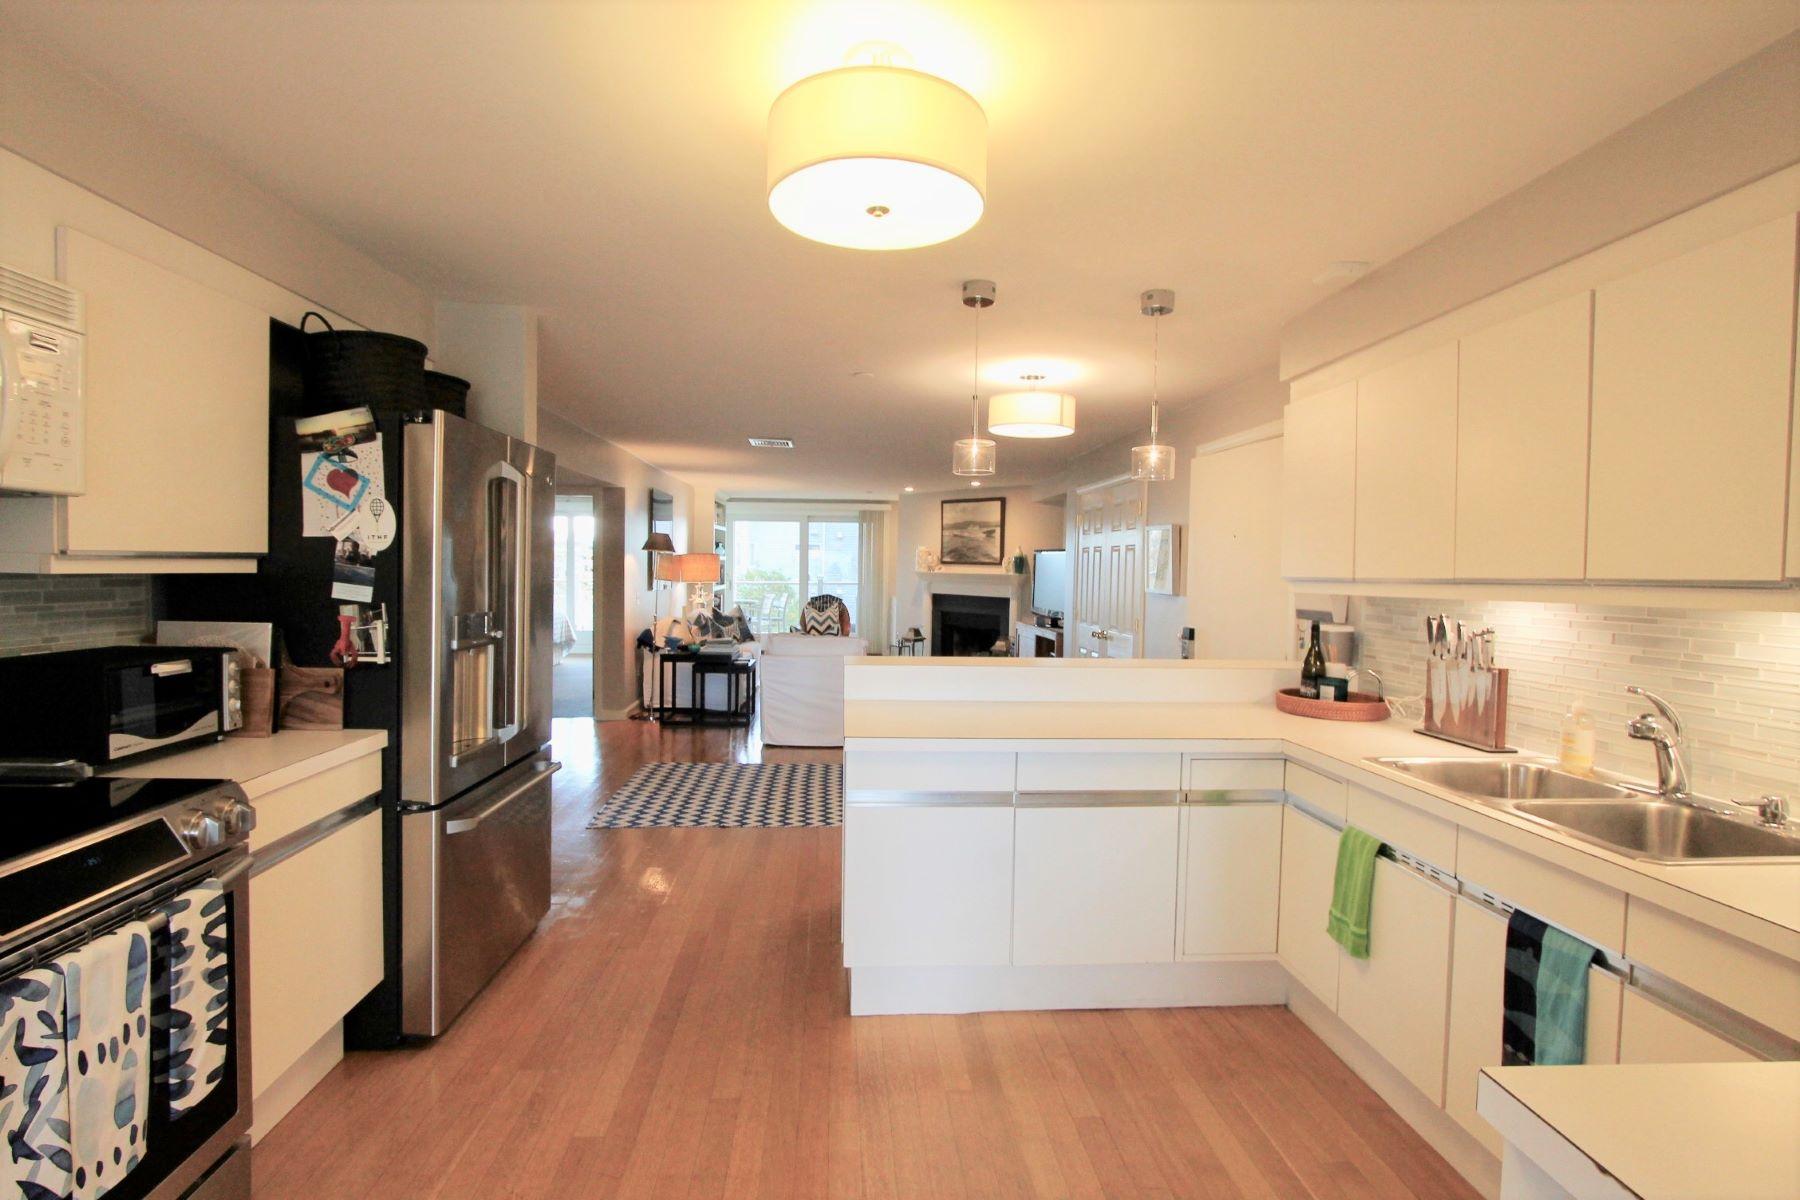 Additional photo for property listing at Coddington Landing 31 Coddington Wharf 22 Newport, Rhode Island 02840 United States